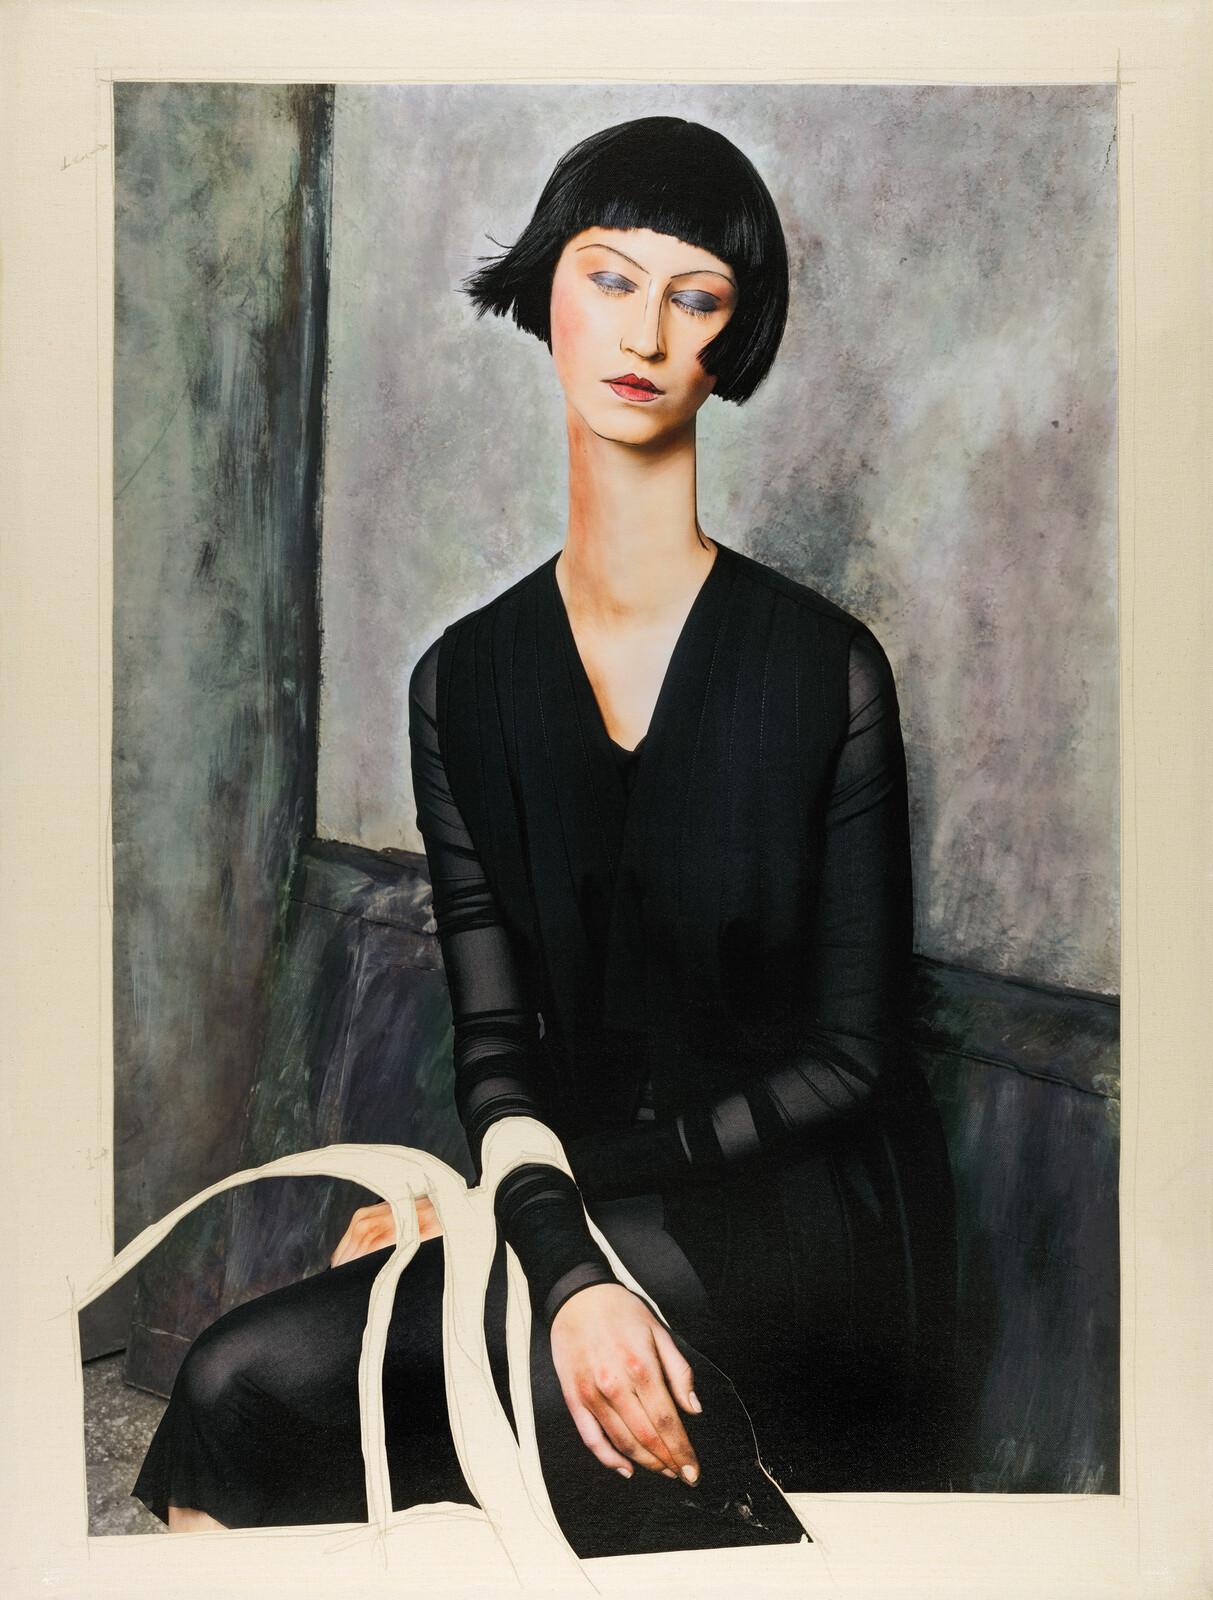 Women V (after Modigliani) - Efren Isaza